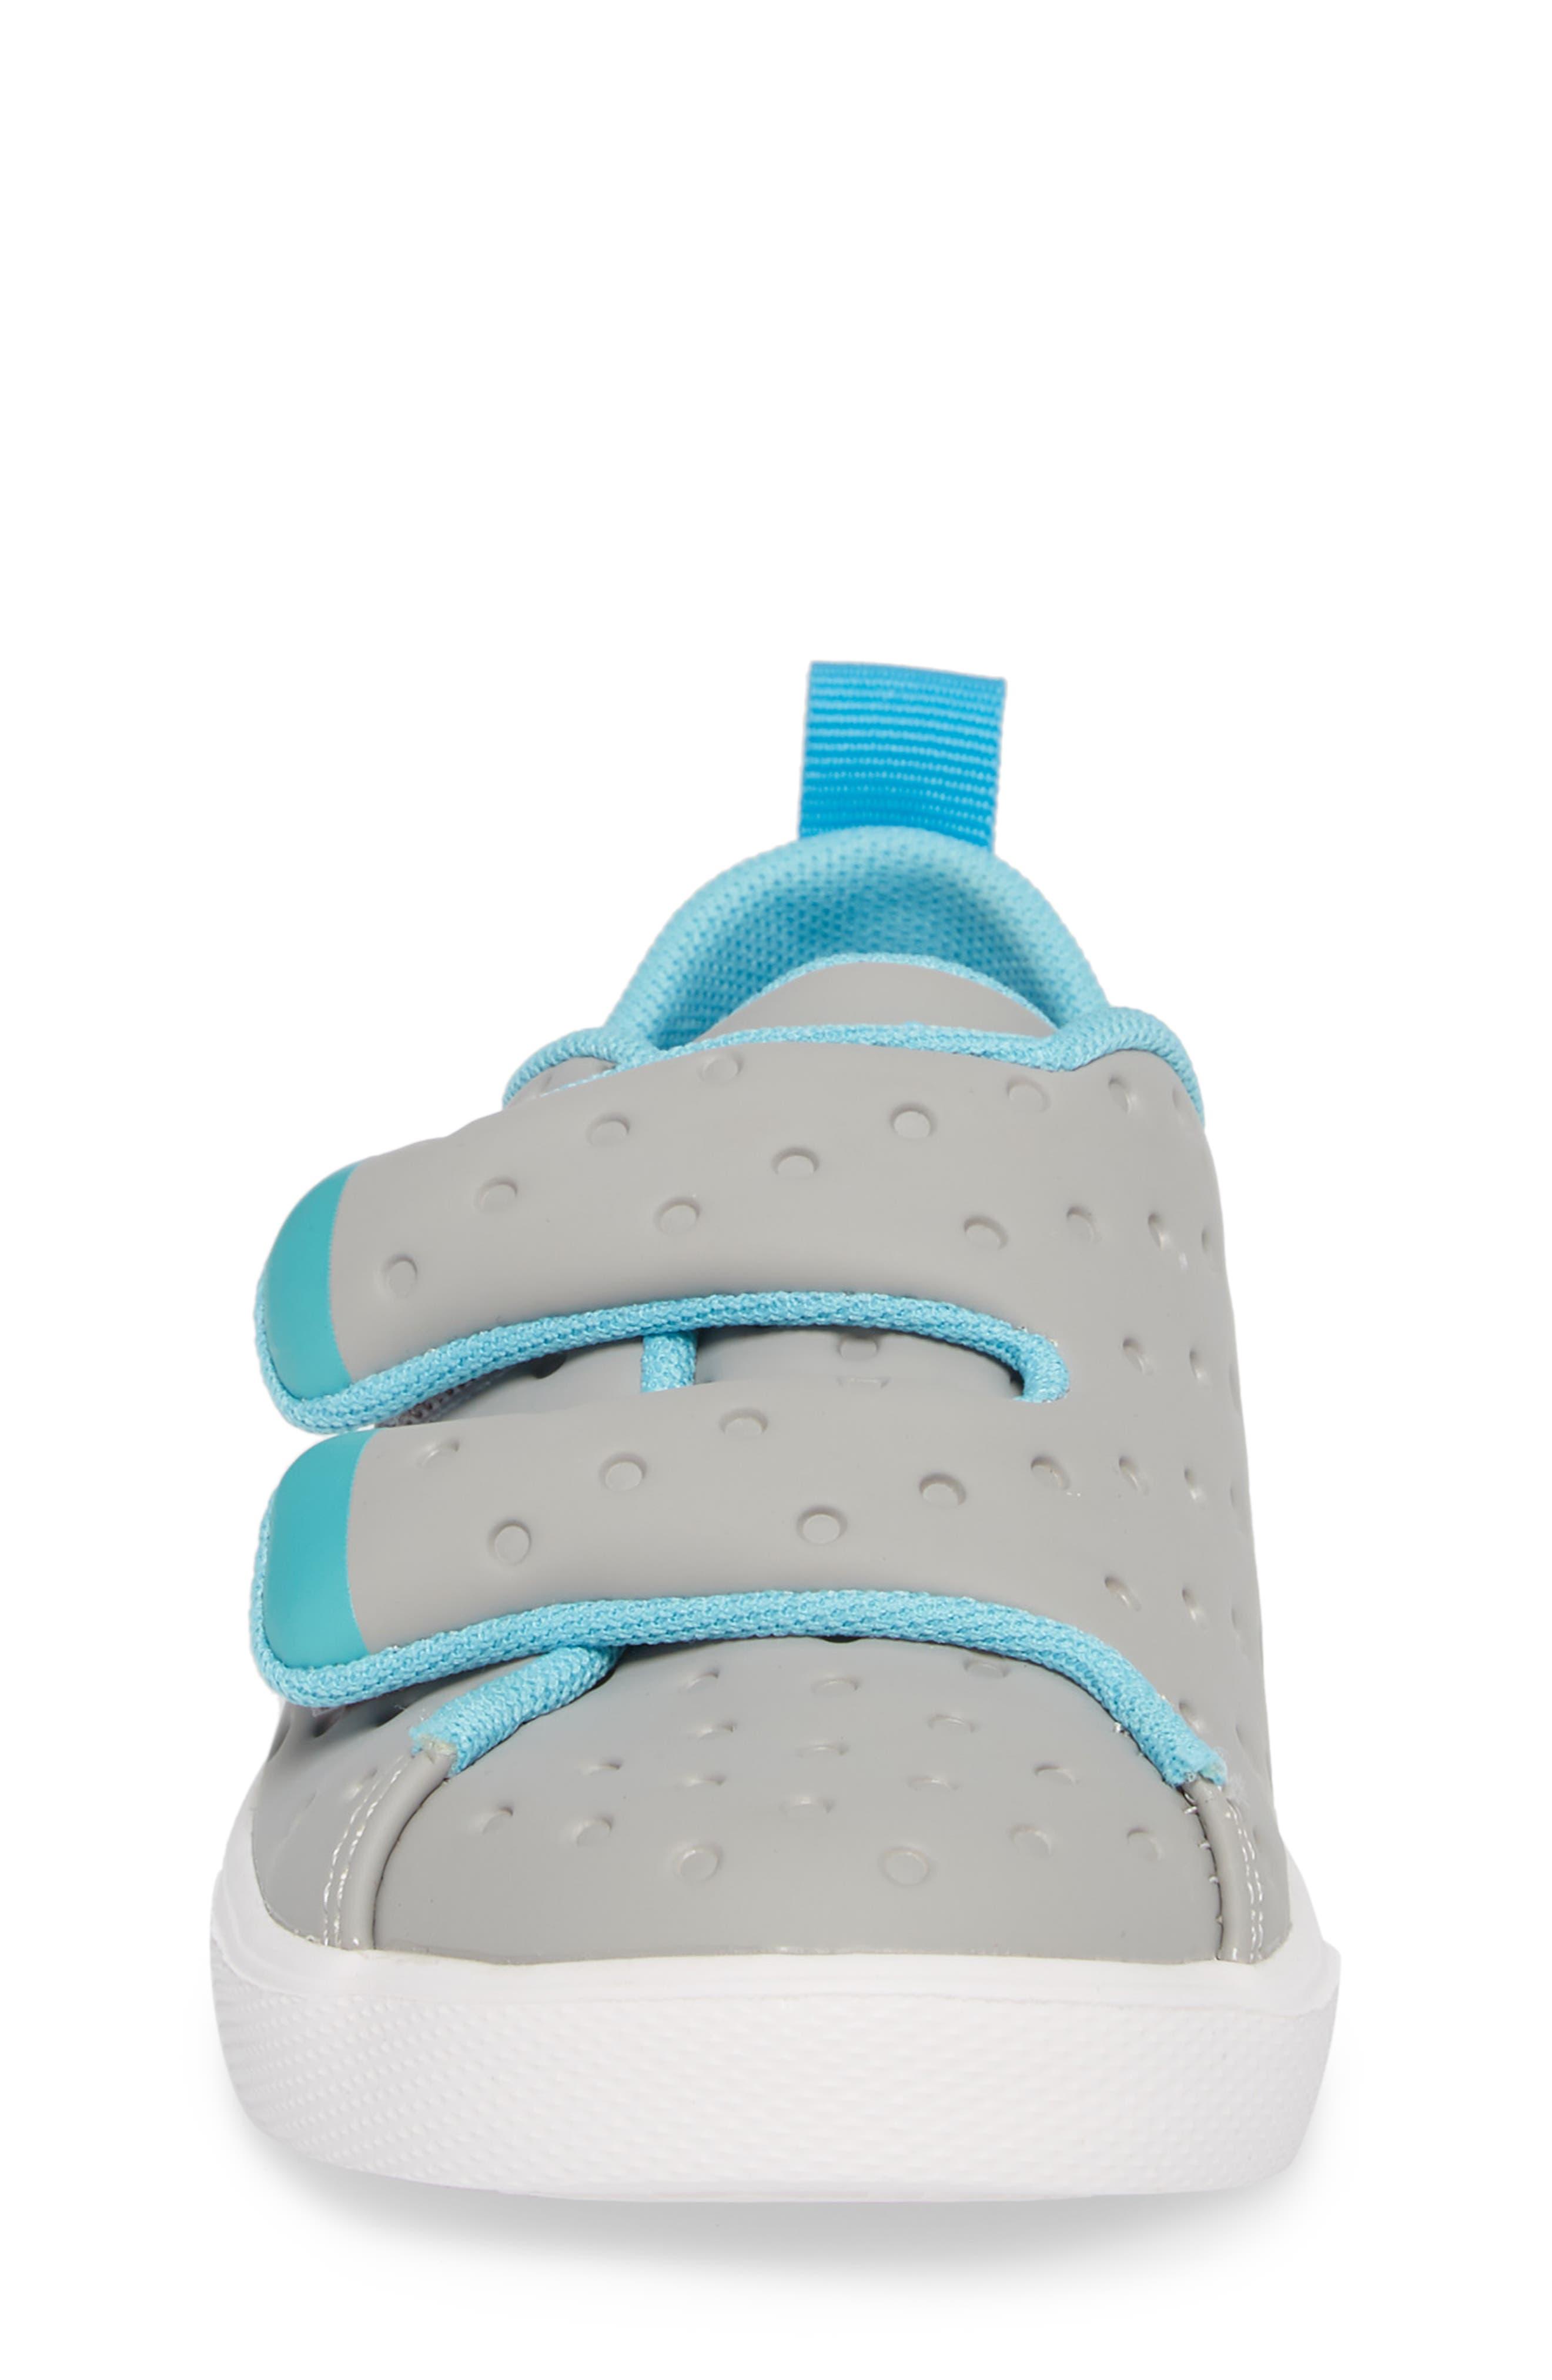 Monaco Sneaker,                             Alternate thumbnail 4, color,                             PIGEON GREY/ POOL BOOL/ WHITE